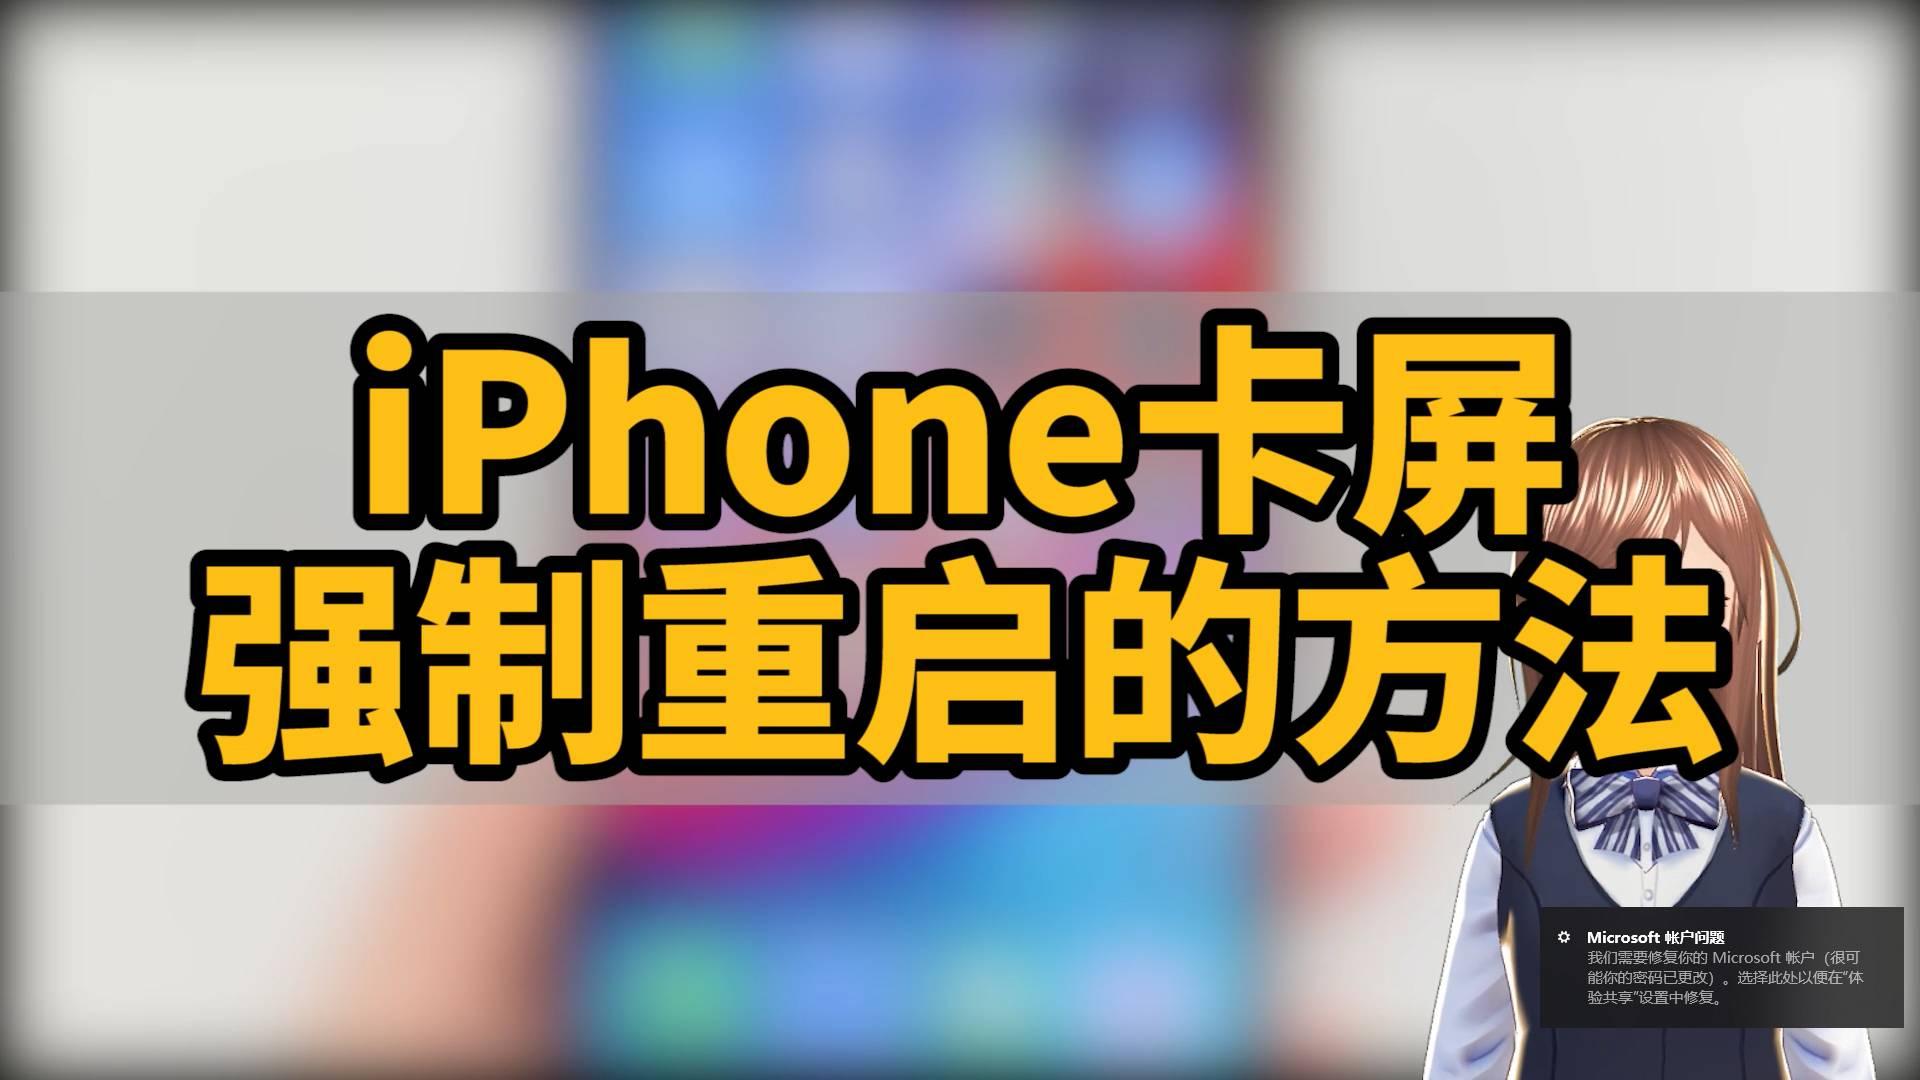 iPhone卡屏了,这样做可以强制重启!